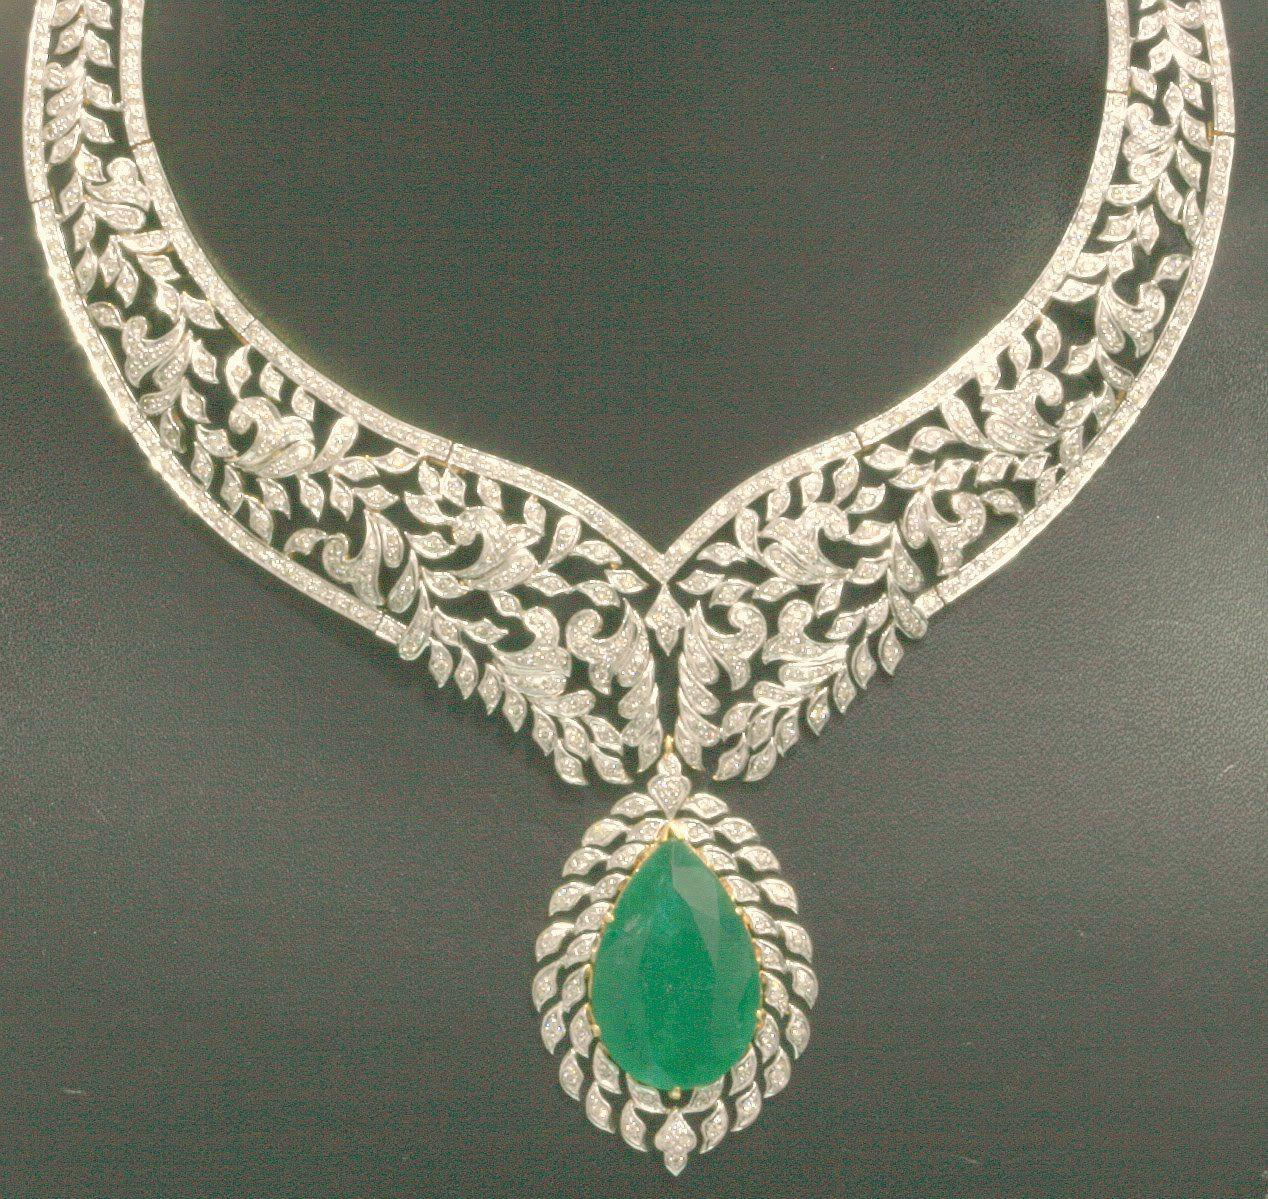 Images of jewellery kenetiks com - Http Images5 Fanpop Com Image Photos 30600000 Emerald Necklace Jewelry 30684431 1268 1199 Jpg Jewelry Pinterest Emerald Necklace Emeralds And